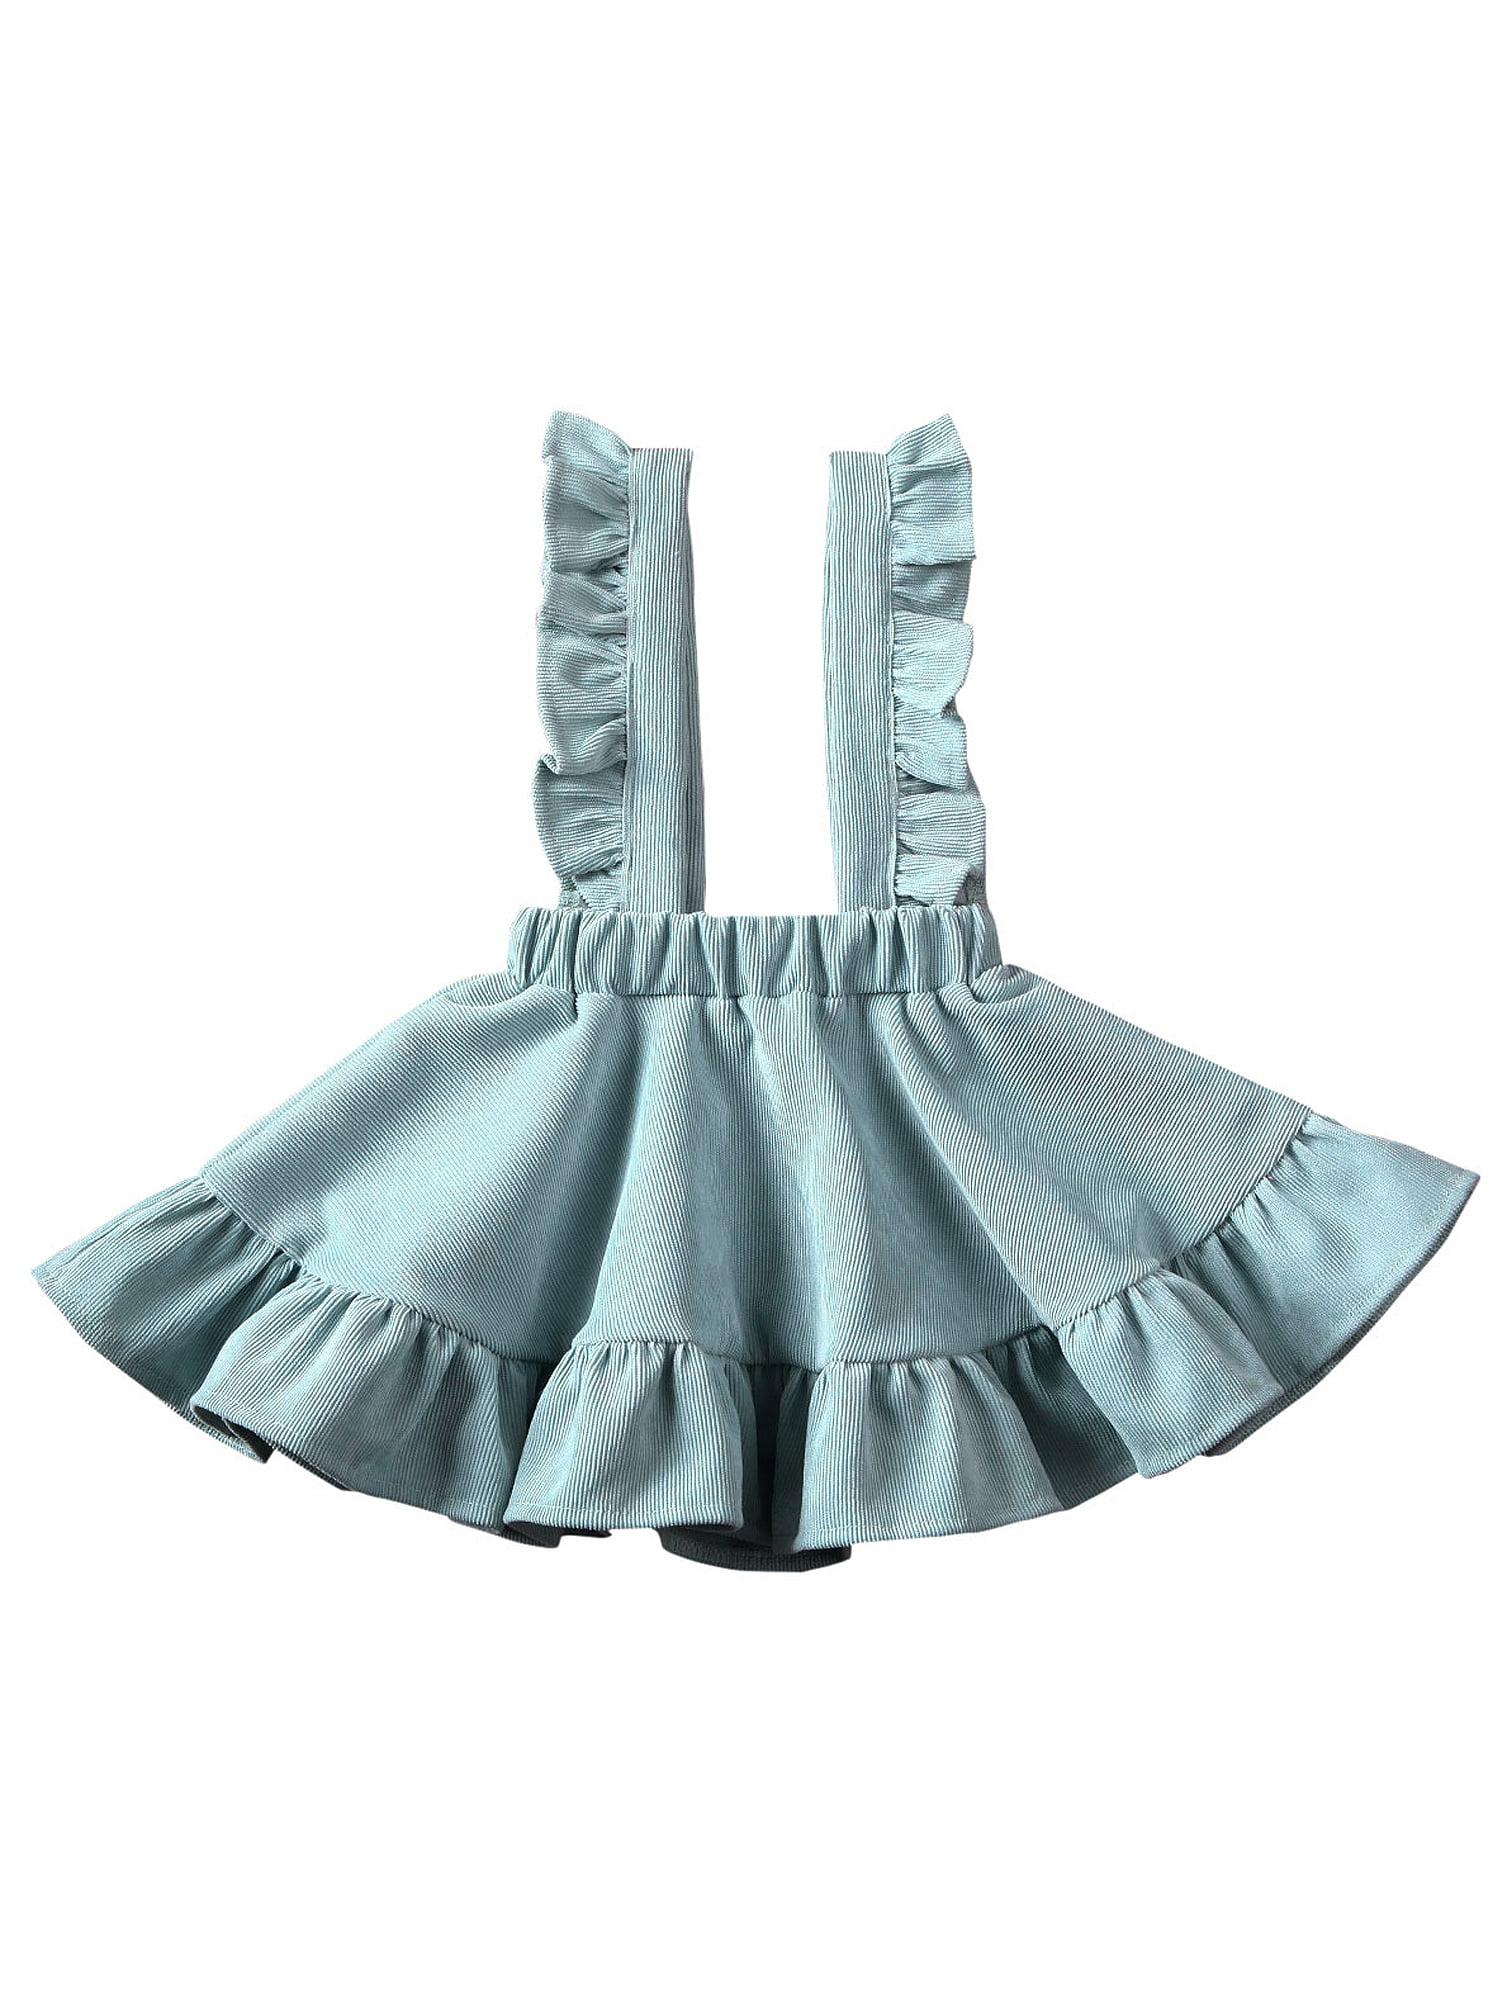 Suefunskry Suefunskry Baby Girls Dress Tops Kids Tutu Skirt Suspender Wedding Party Outfits Clothes Walmart Com Walmart Com